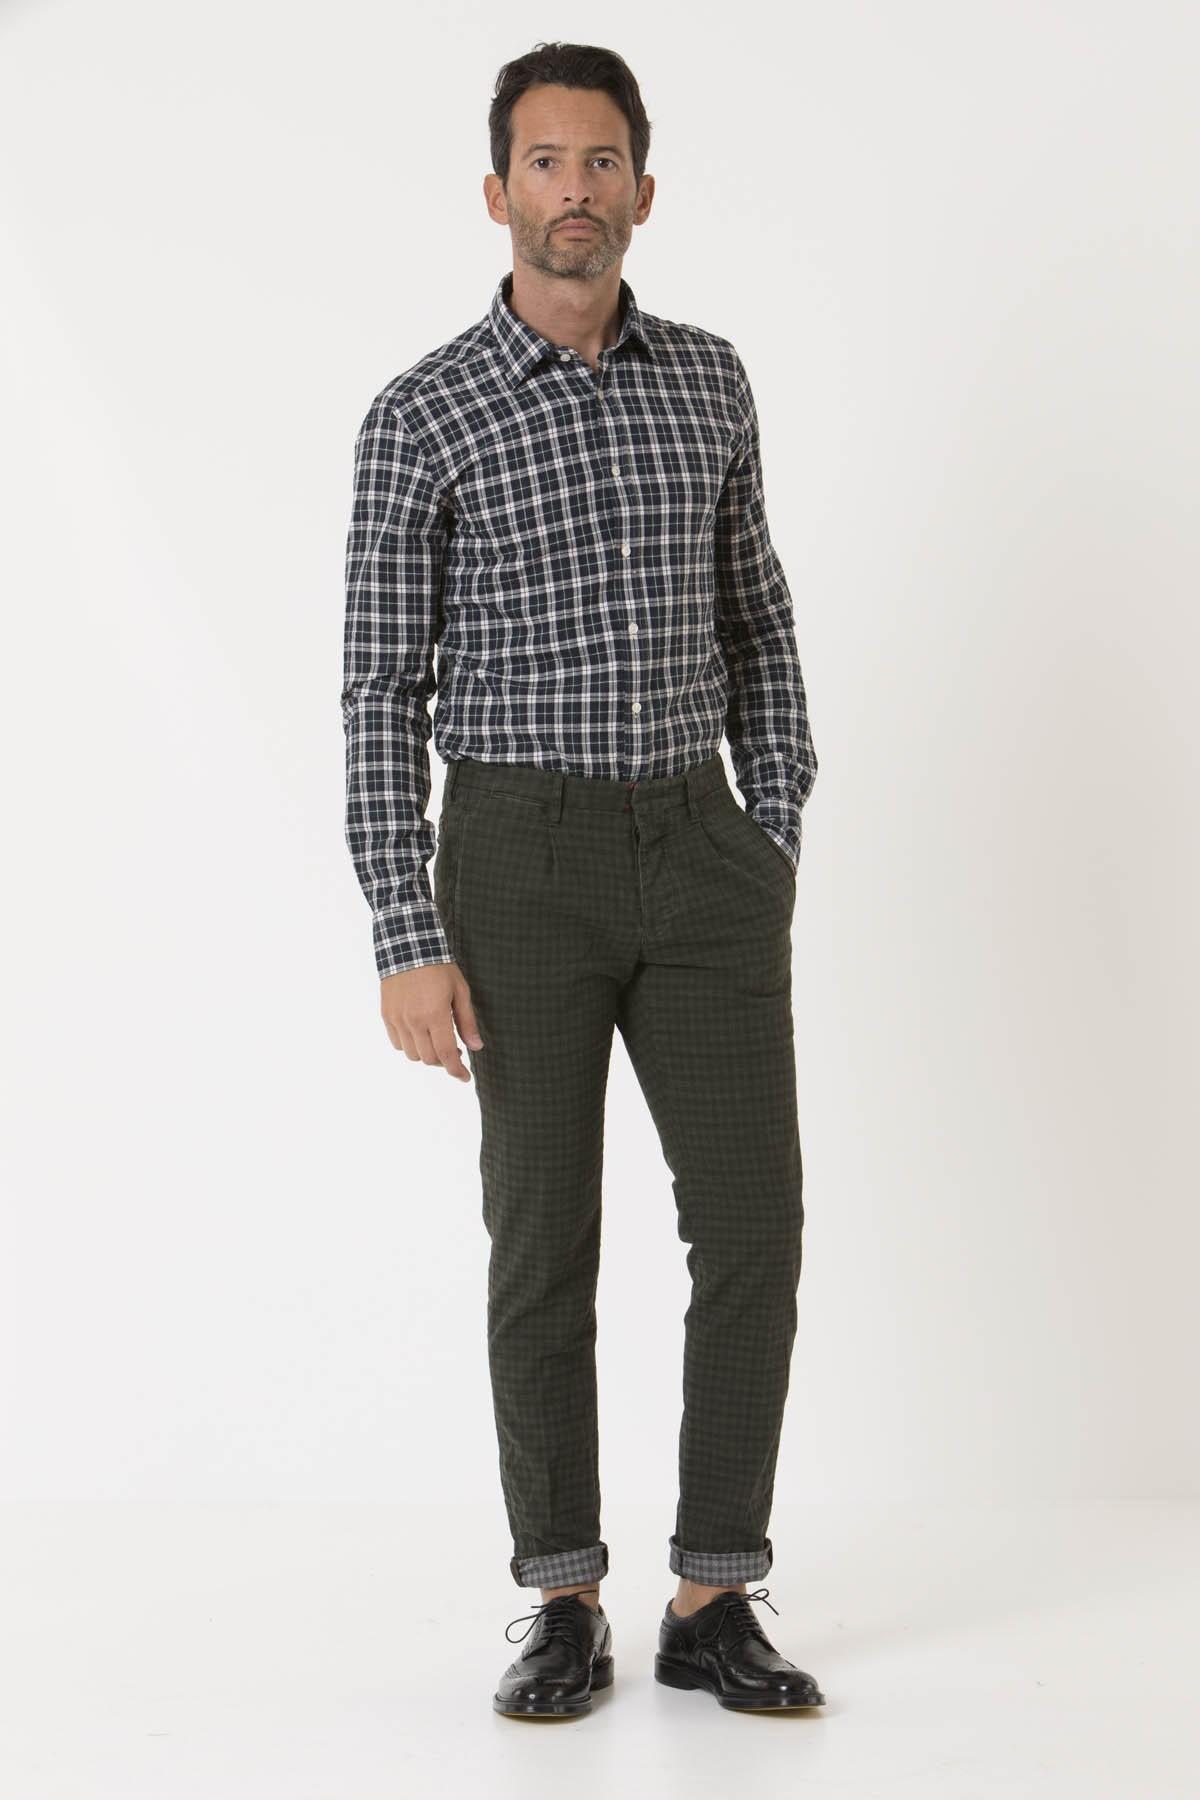 Pantaloni SLACKS per uomo INCOTEX A/I 18-19